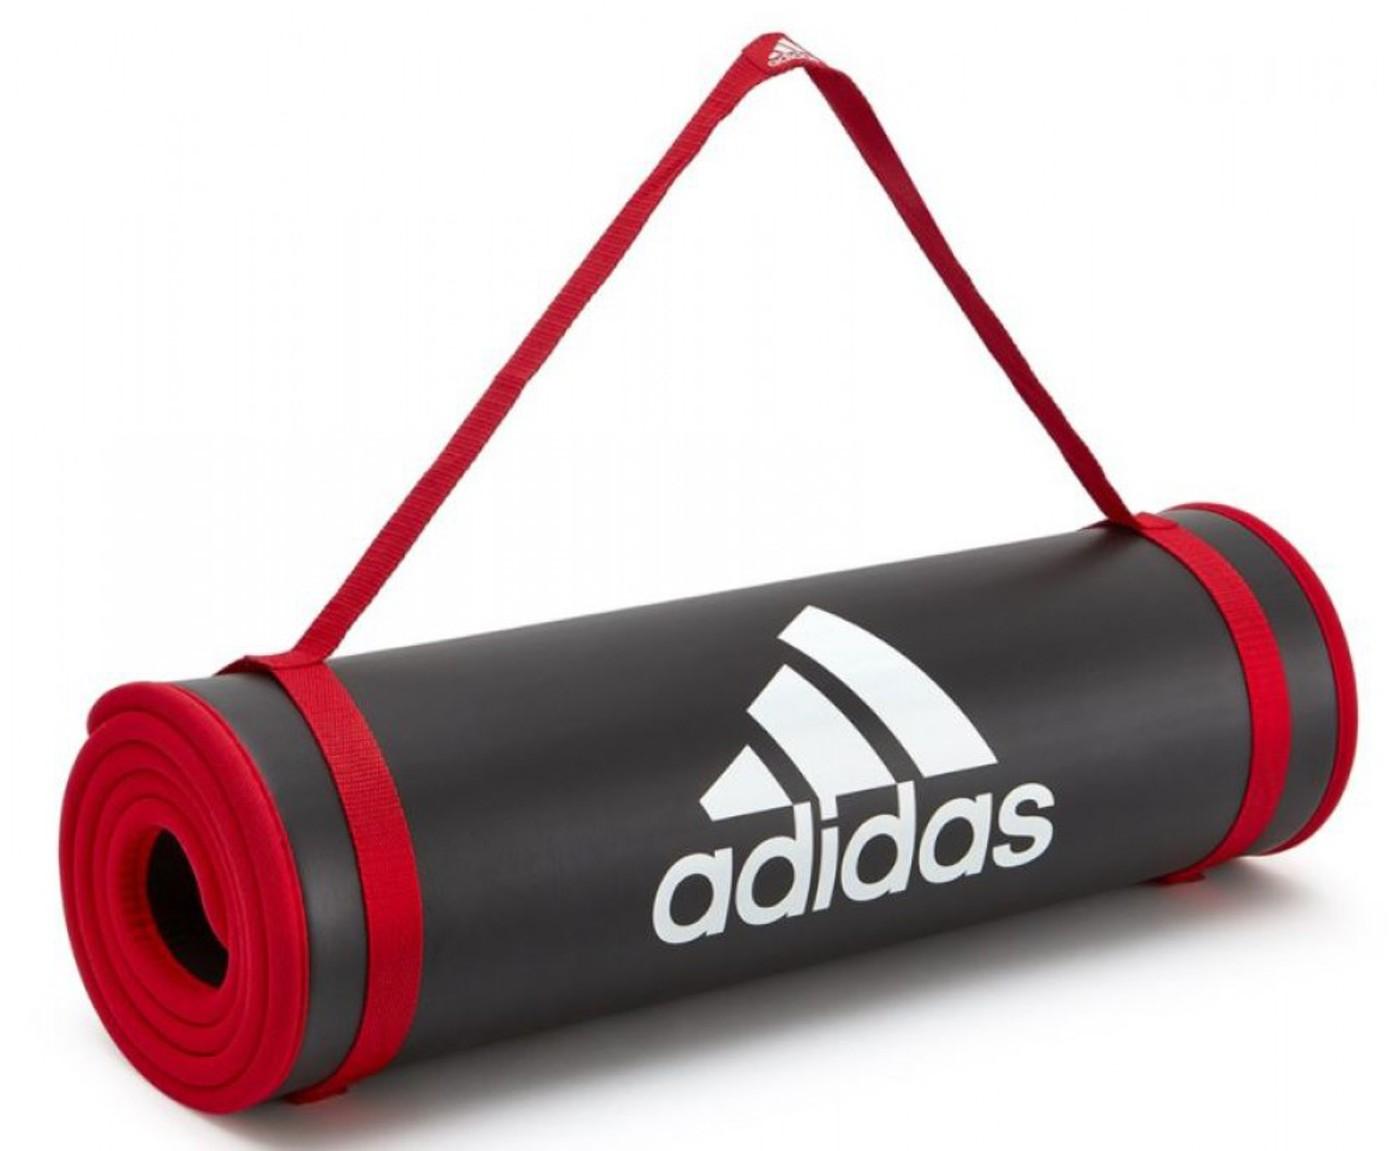 ADIDAS Training Mat -